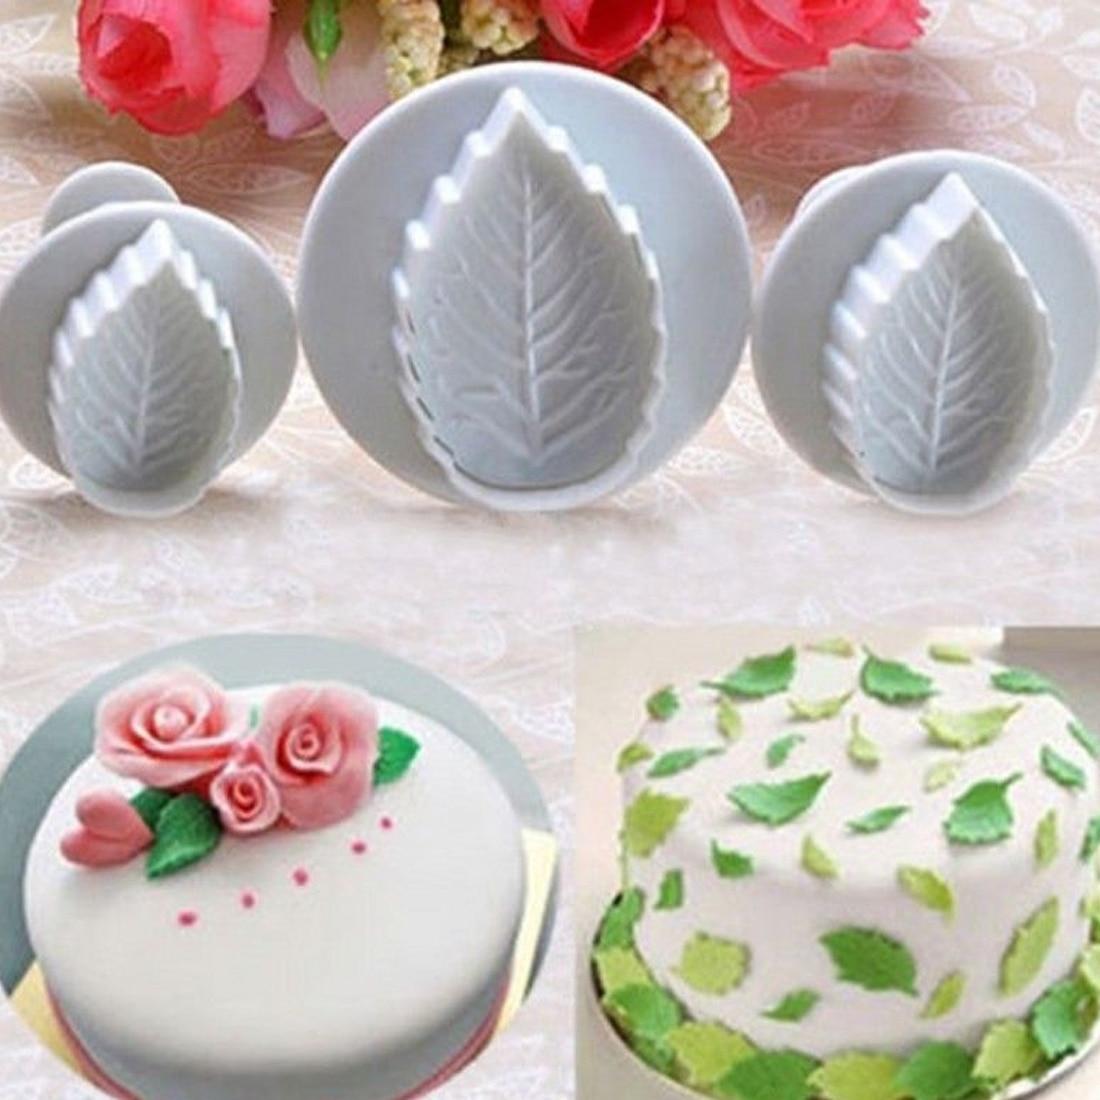 3 Pcs Cake Xmas Snowflake shape Plunger Fondant Decor Sugarcraft Mold Cutter*CC